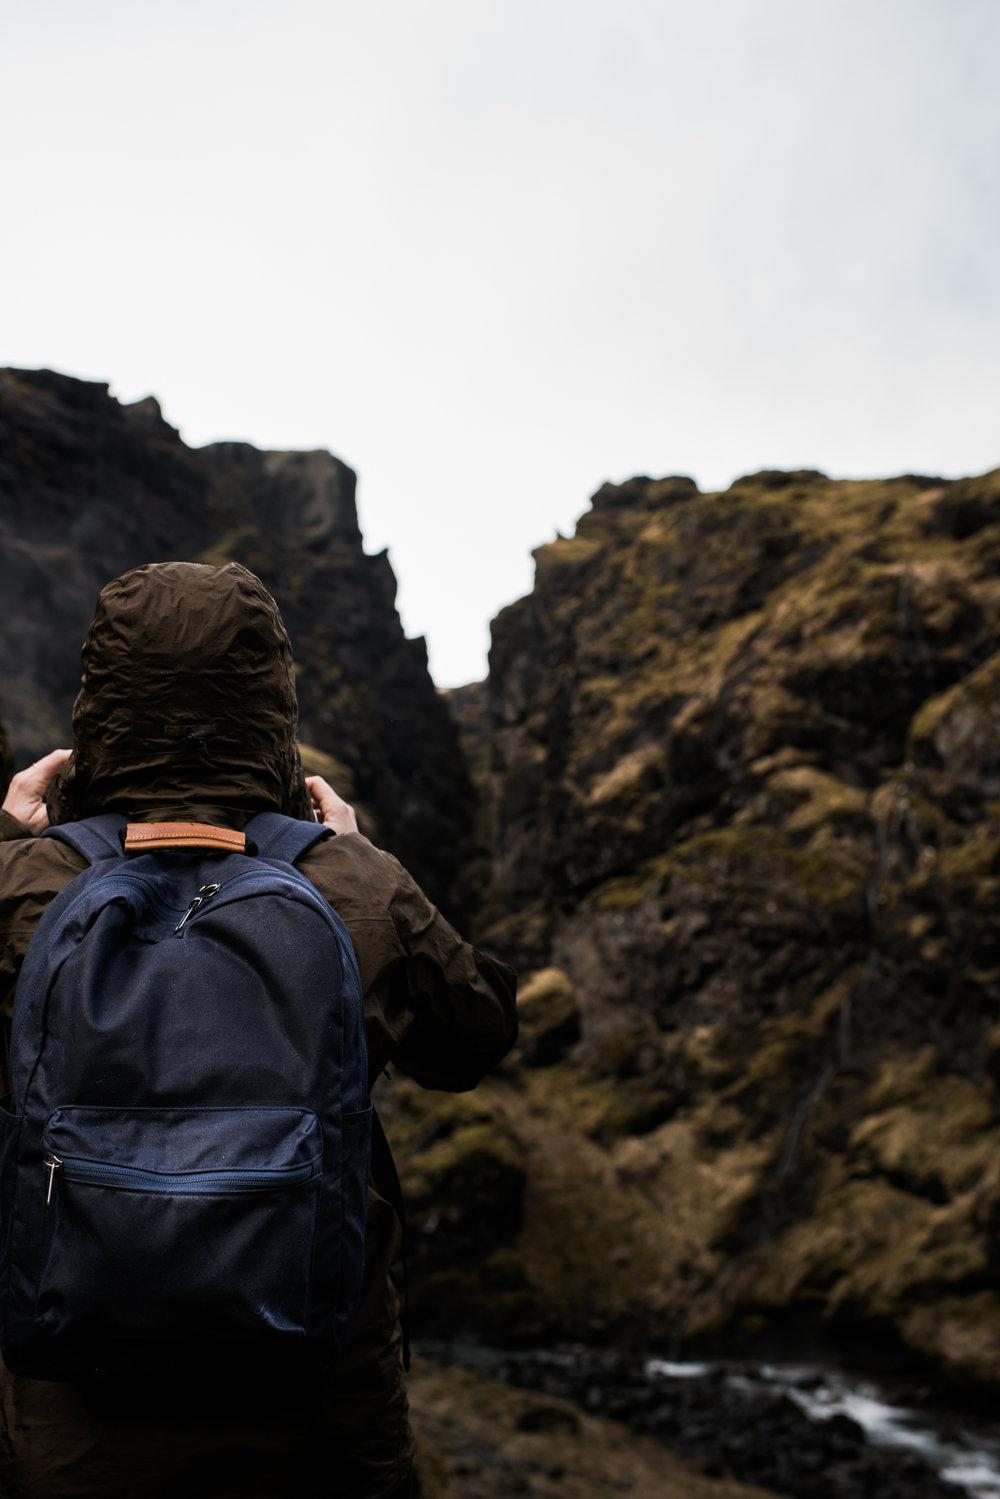 ICELAND_WOMAN_PHOTOGRAPHER_TARASHUPE_OUTDOOR_PHOTOGRAPHY_024.jpg